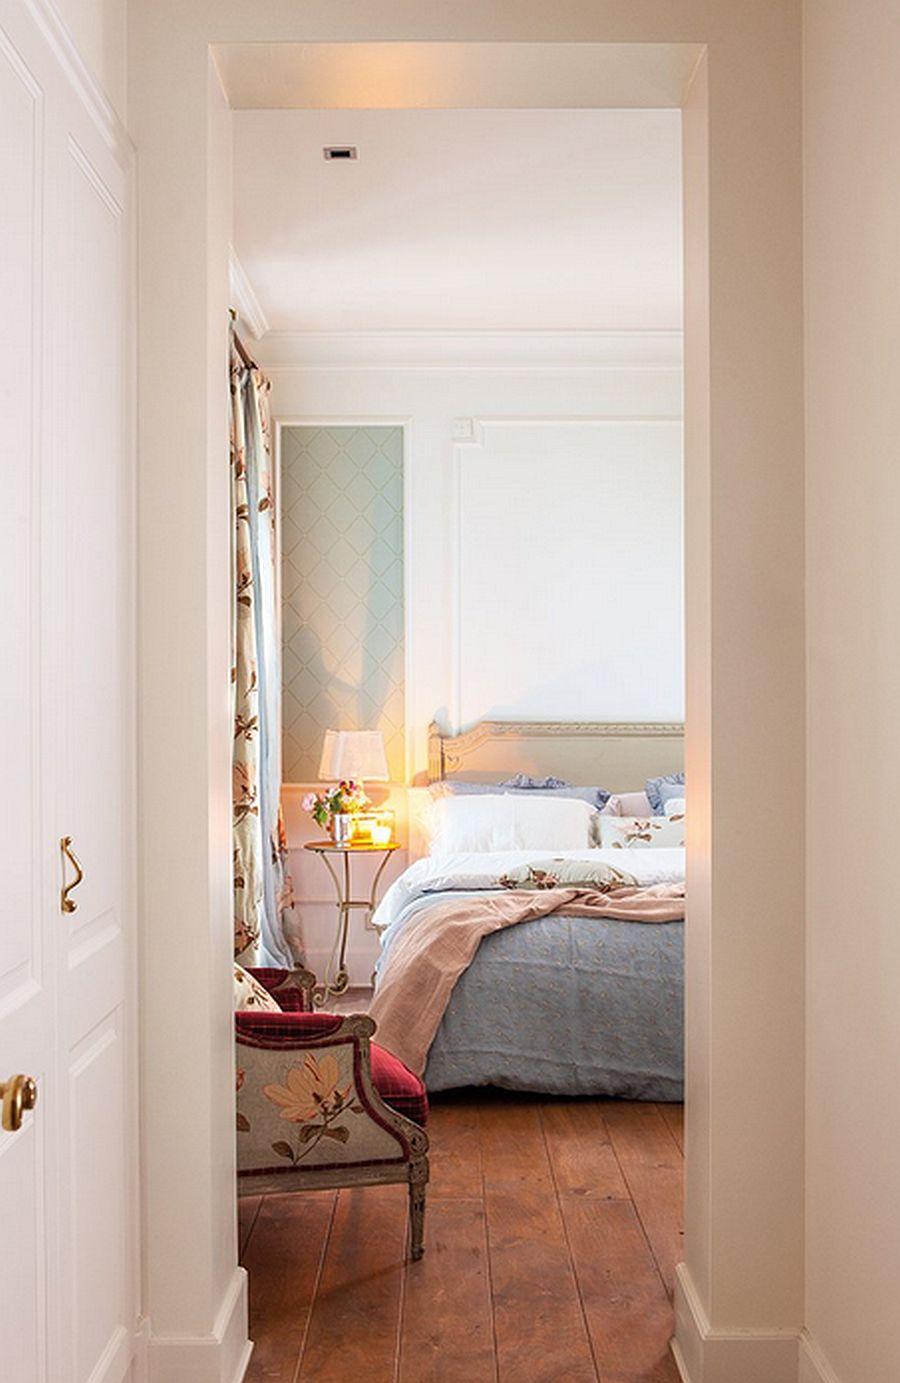 adelaparvu.com despre apartament in cladire veche, casa Spania, design interior Rosa Maria Escofet, Foto ElMueble (10)